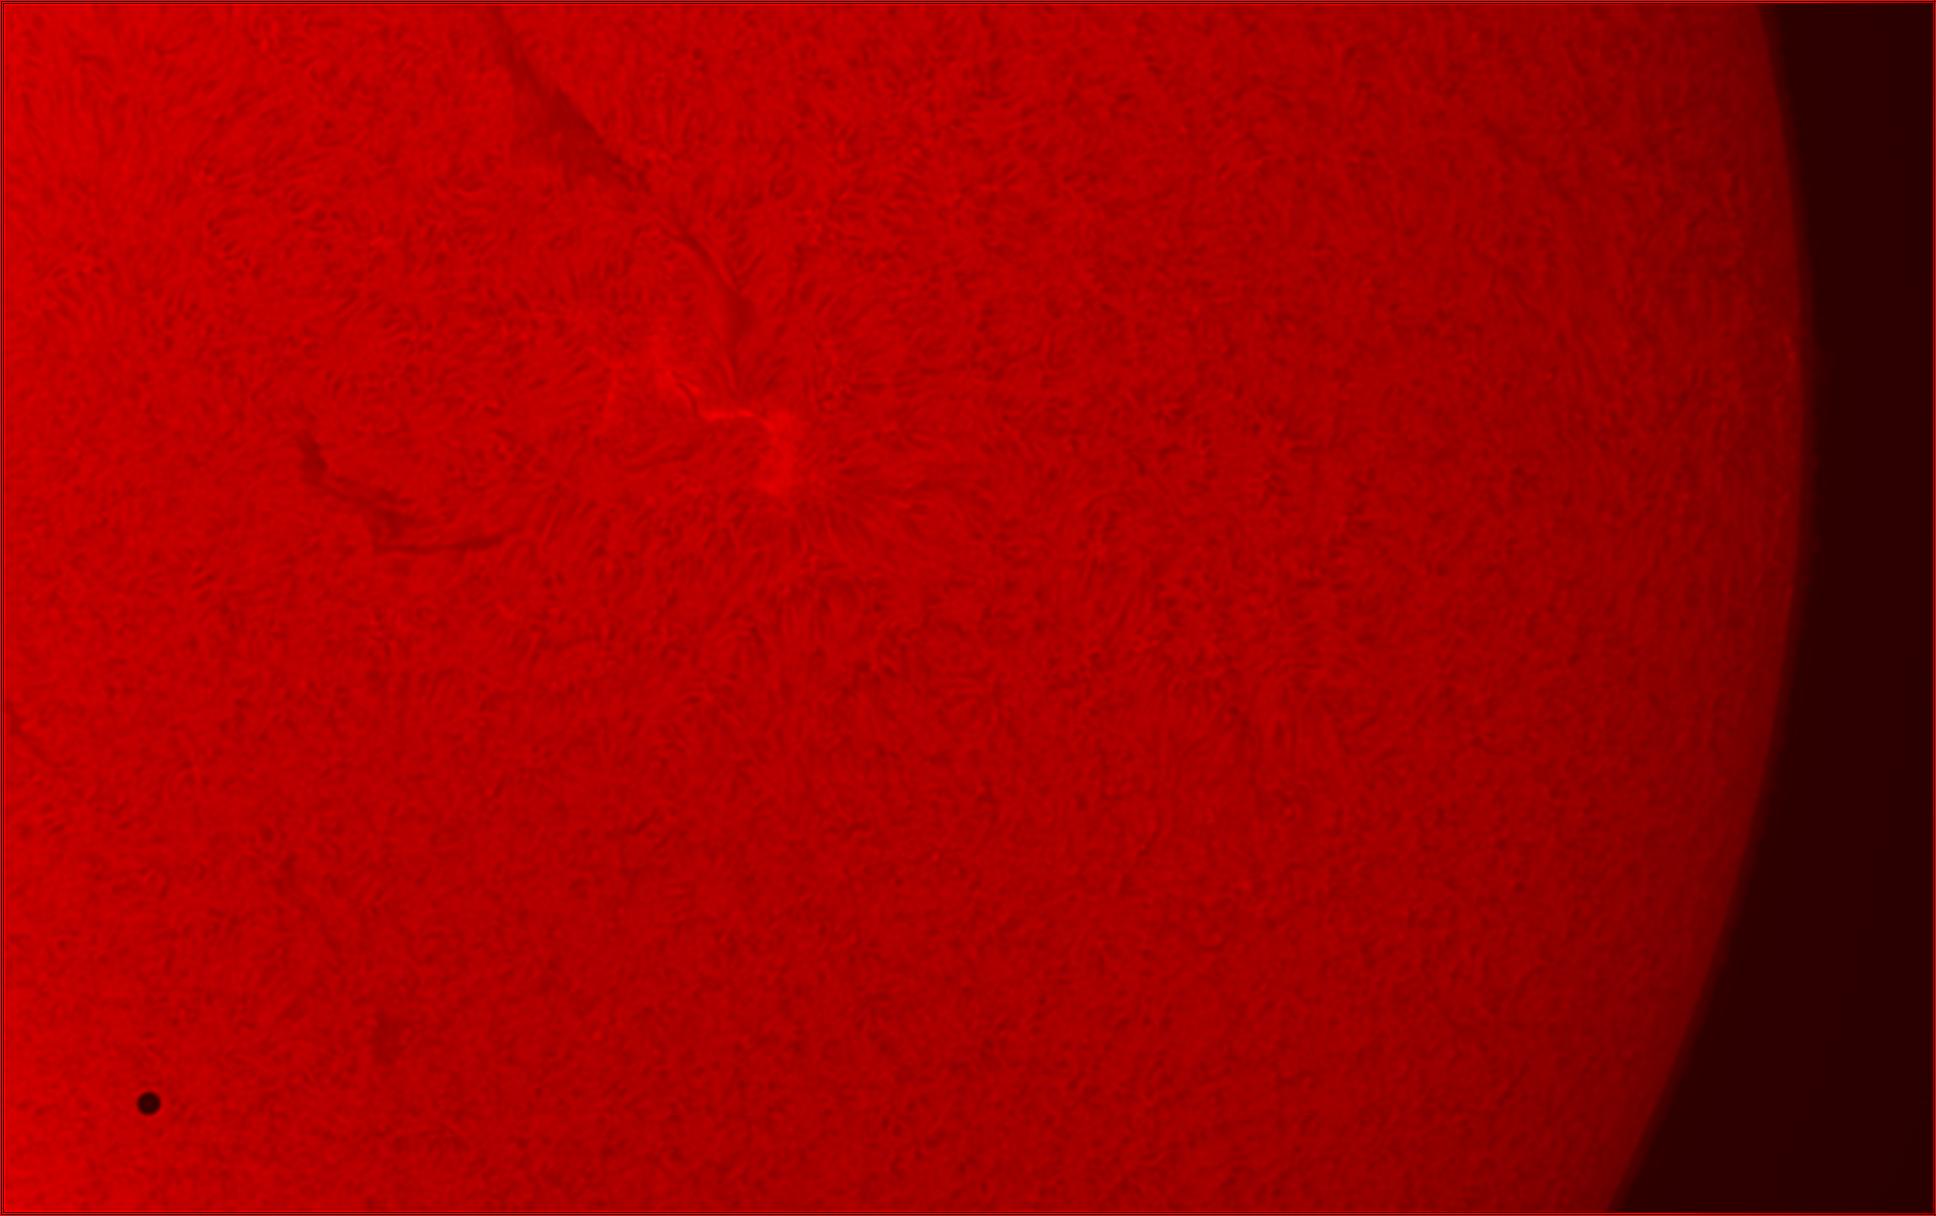 Sonne-H-alpha_2016_05_09_154743_Daystar_74_rs6ll